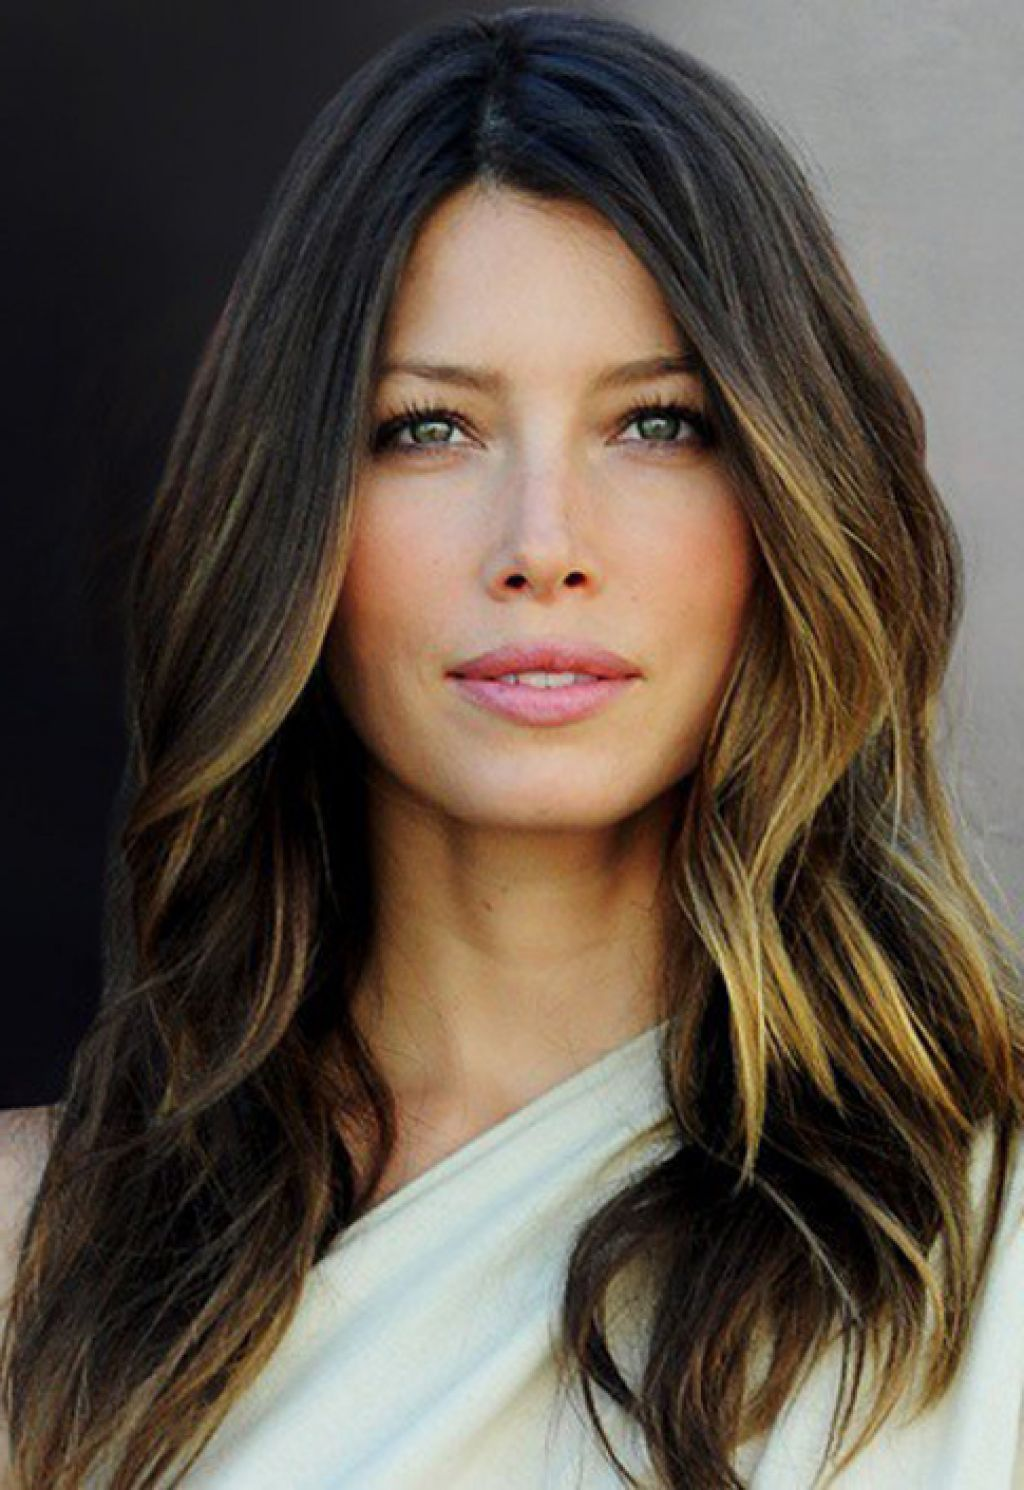 Jessica Biel Hair Oval Face Hair Care Pinterest Jessica Biel